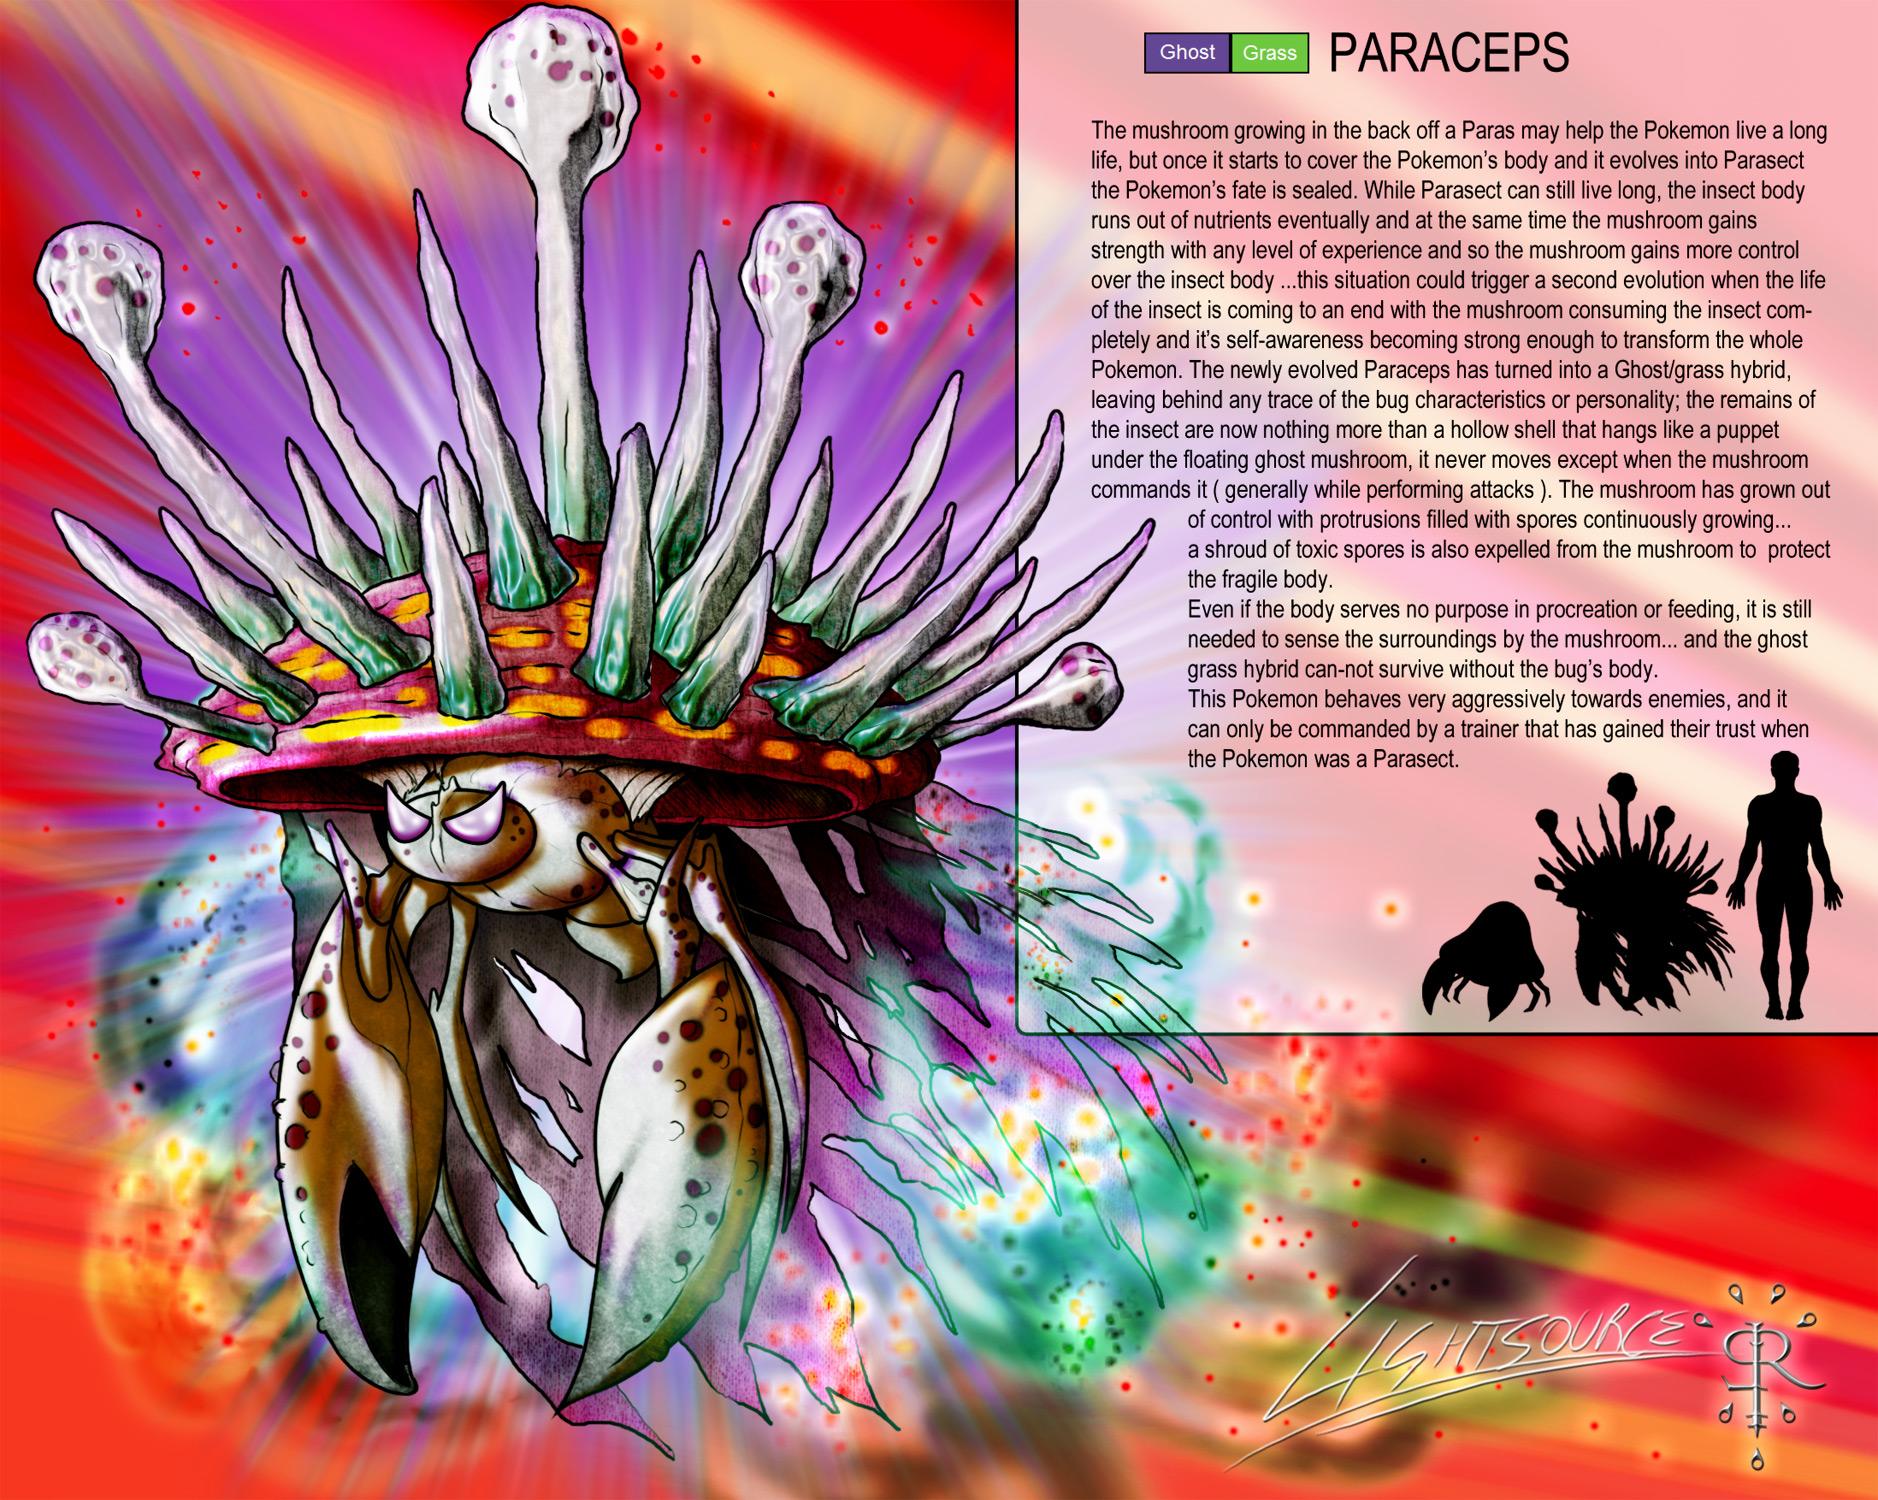 Paraceps-Pokemon concept by xXLightsourceXx